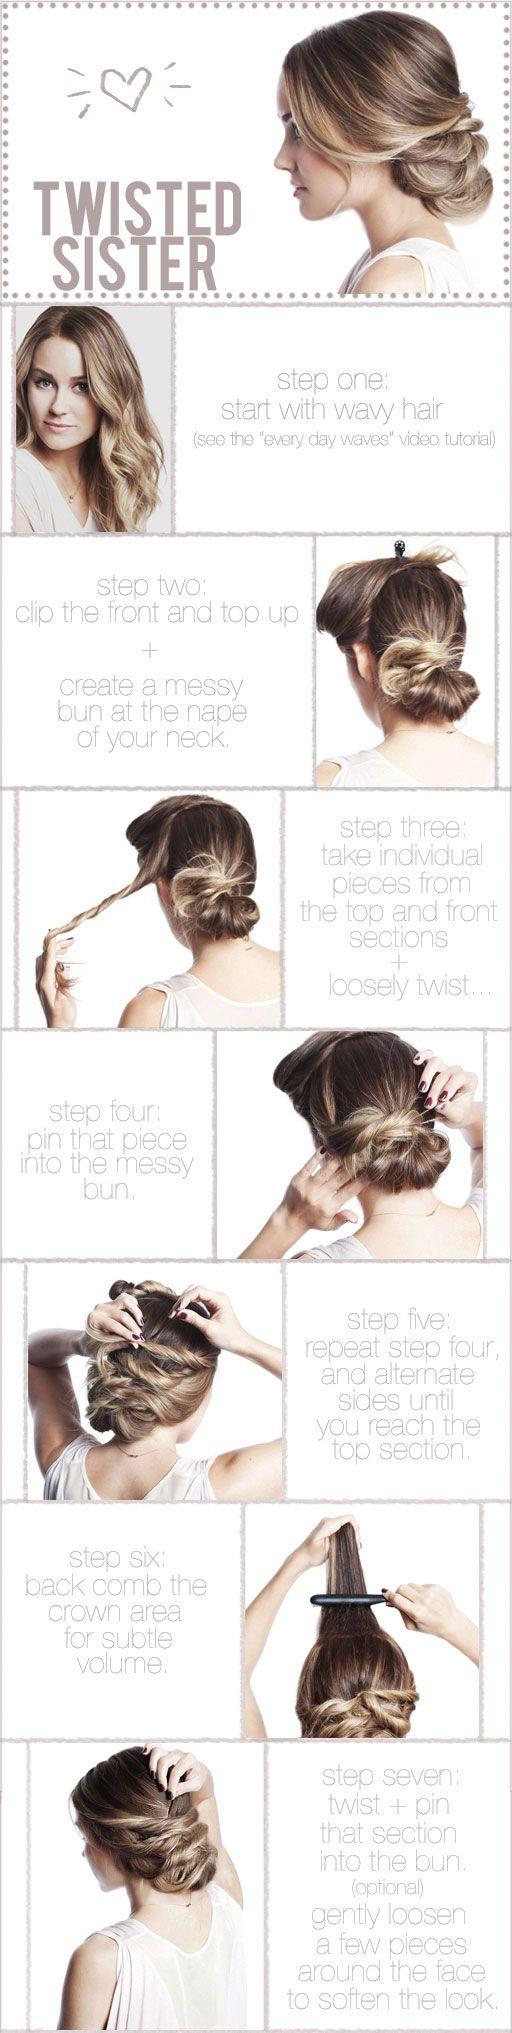 cool twisted hair ideas.